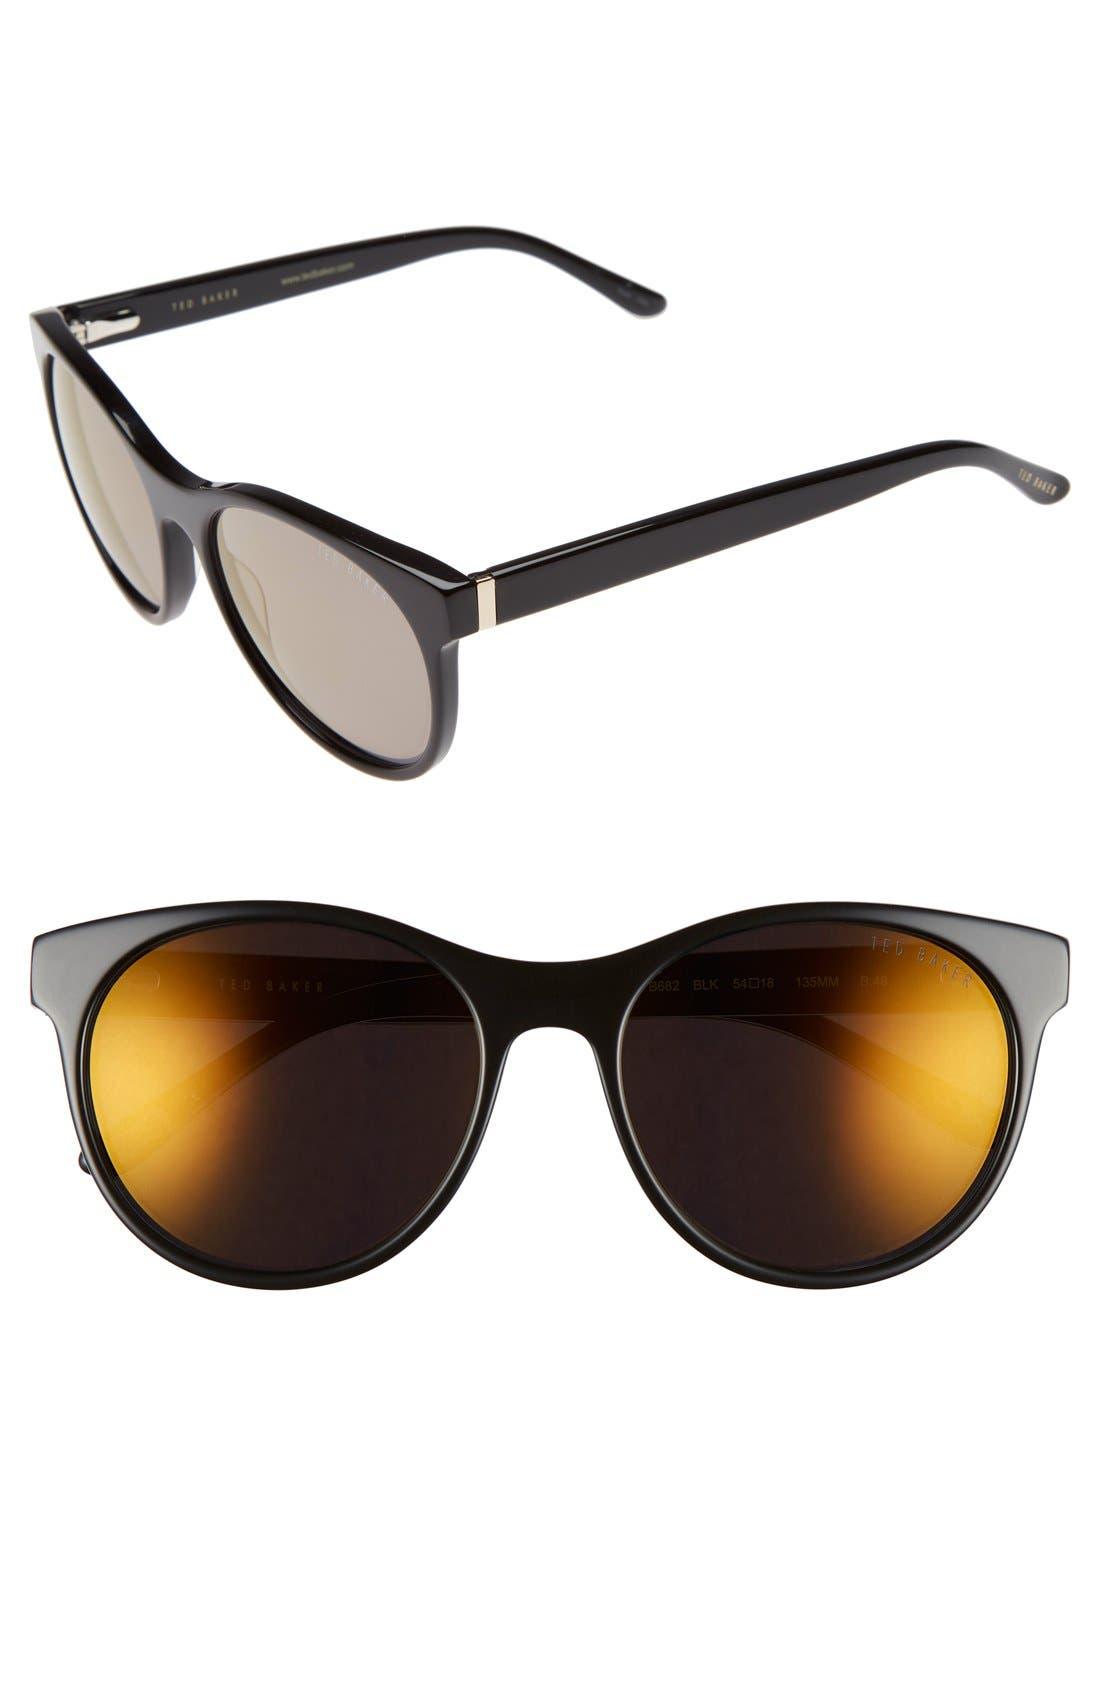 54mm Retro Sunglasses,                             Main thumbnail 2, color,